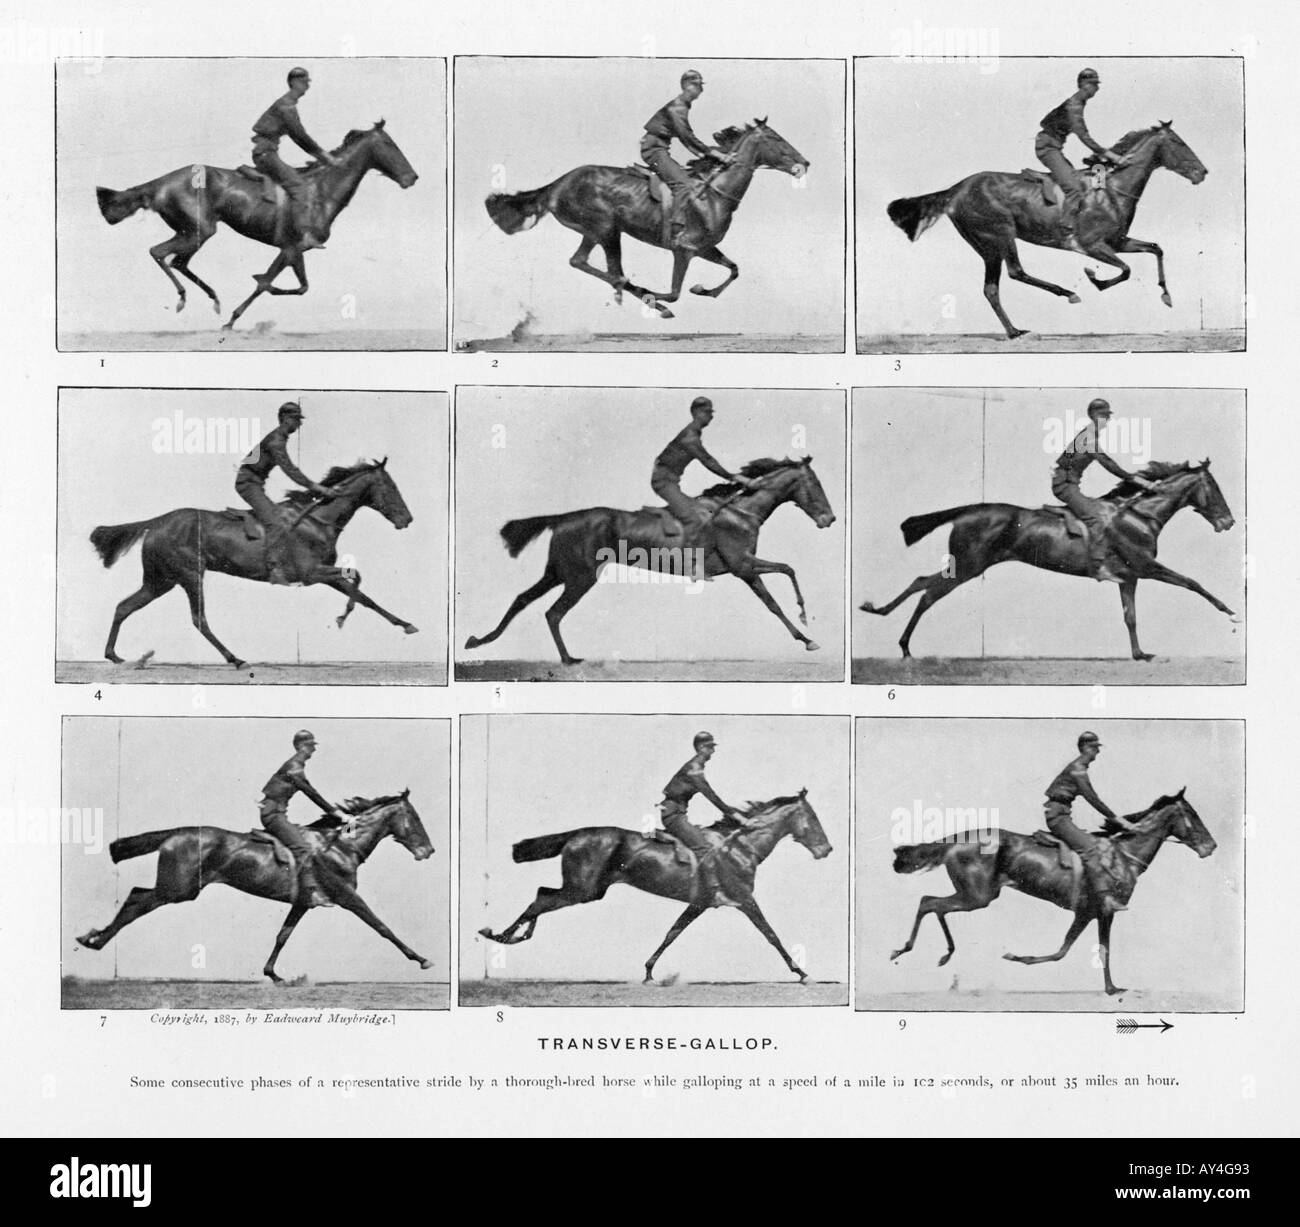 Muybridge cavalli galoppo Immagini Stock